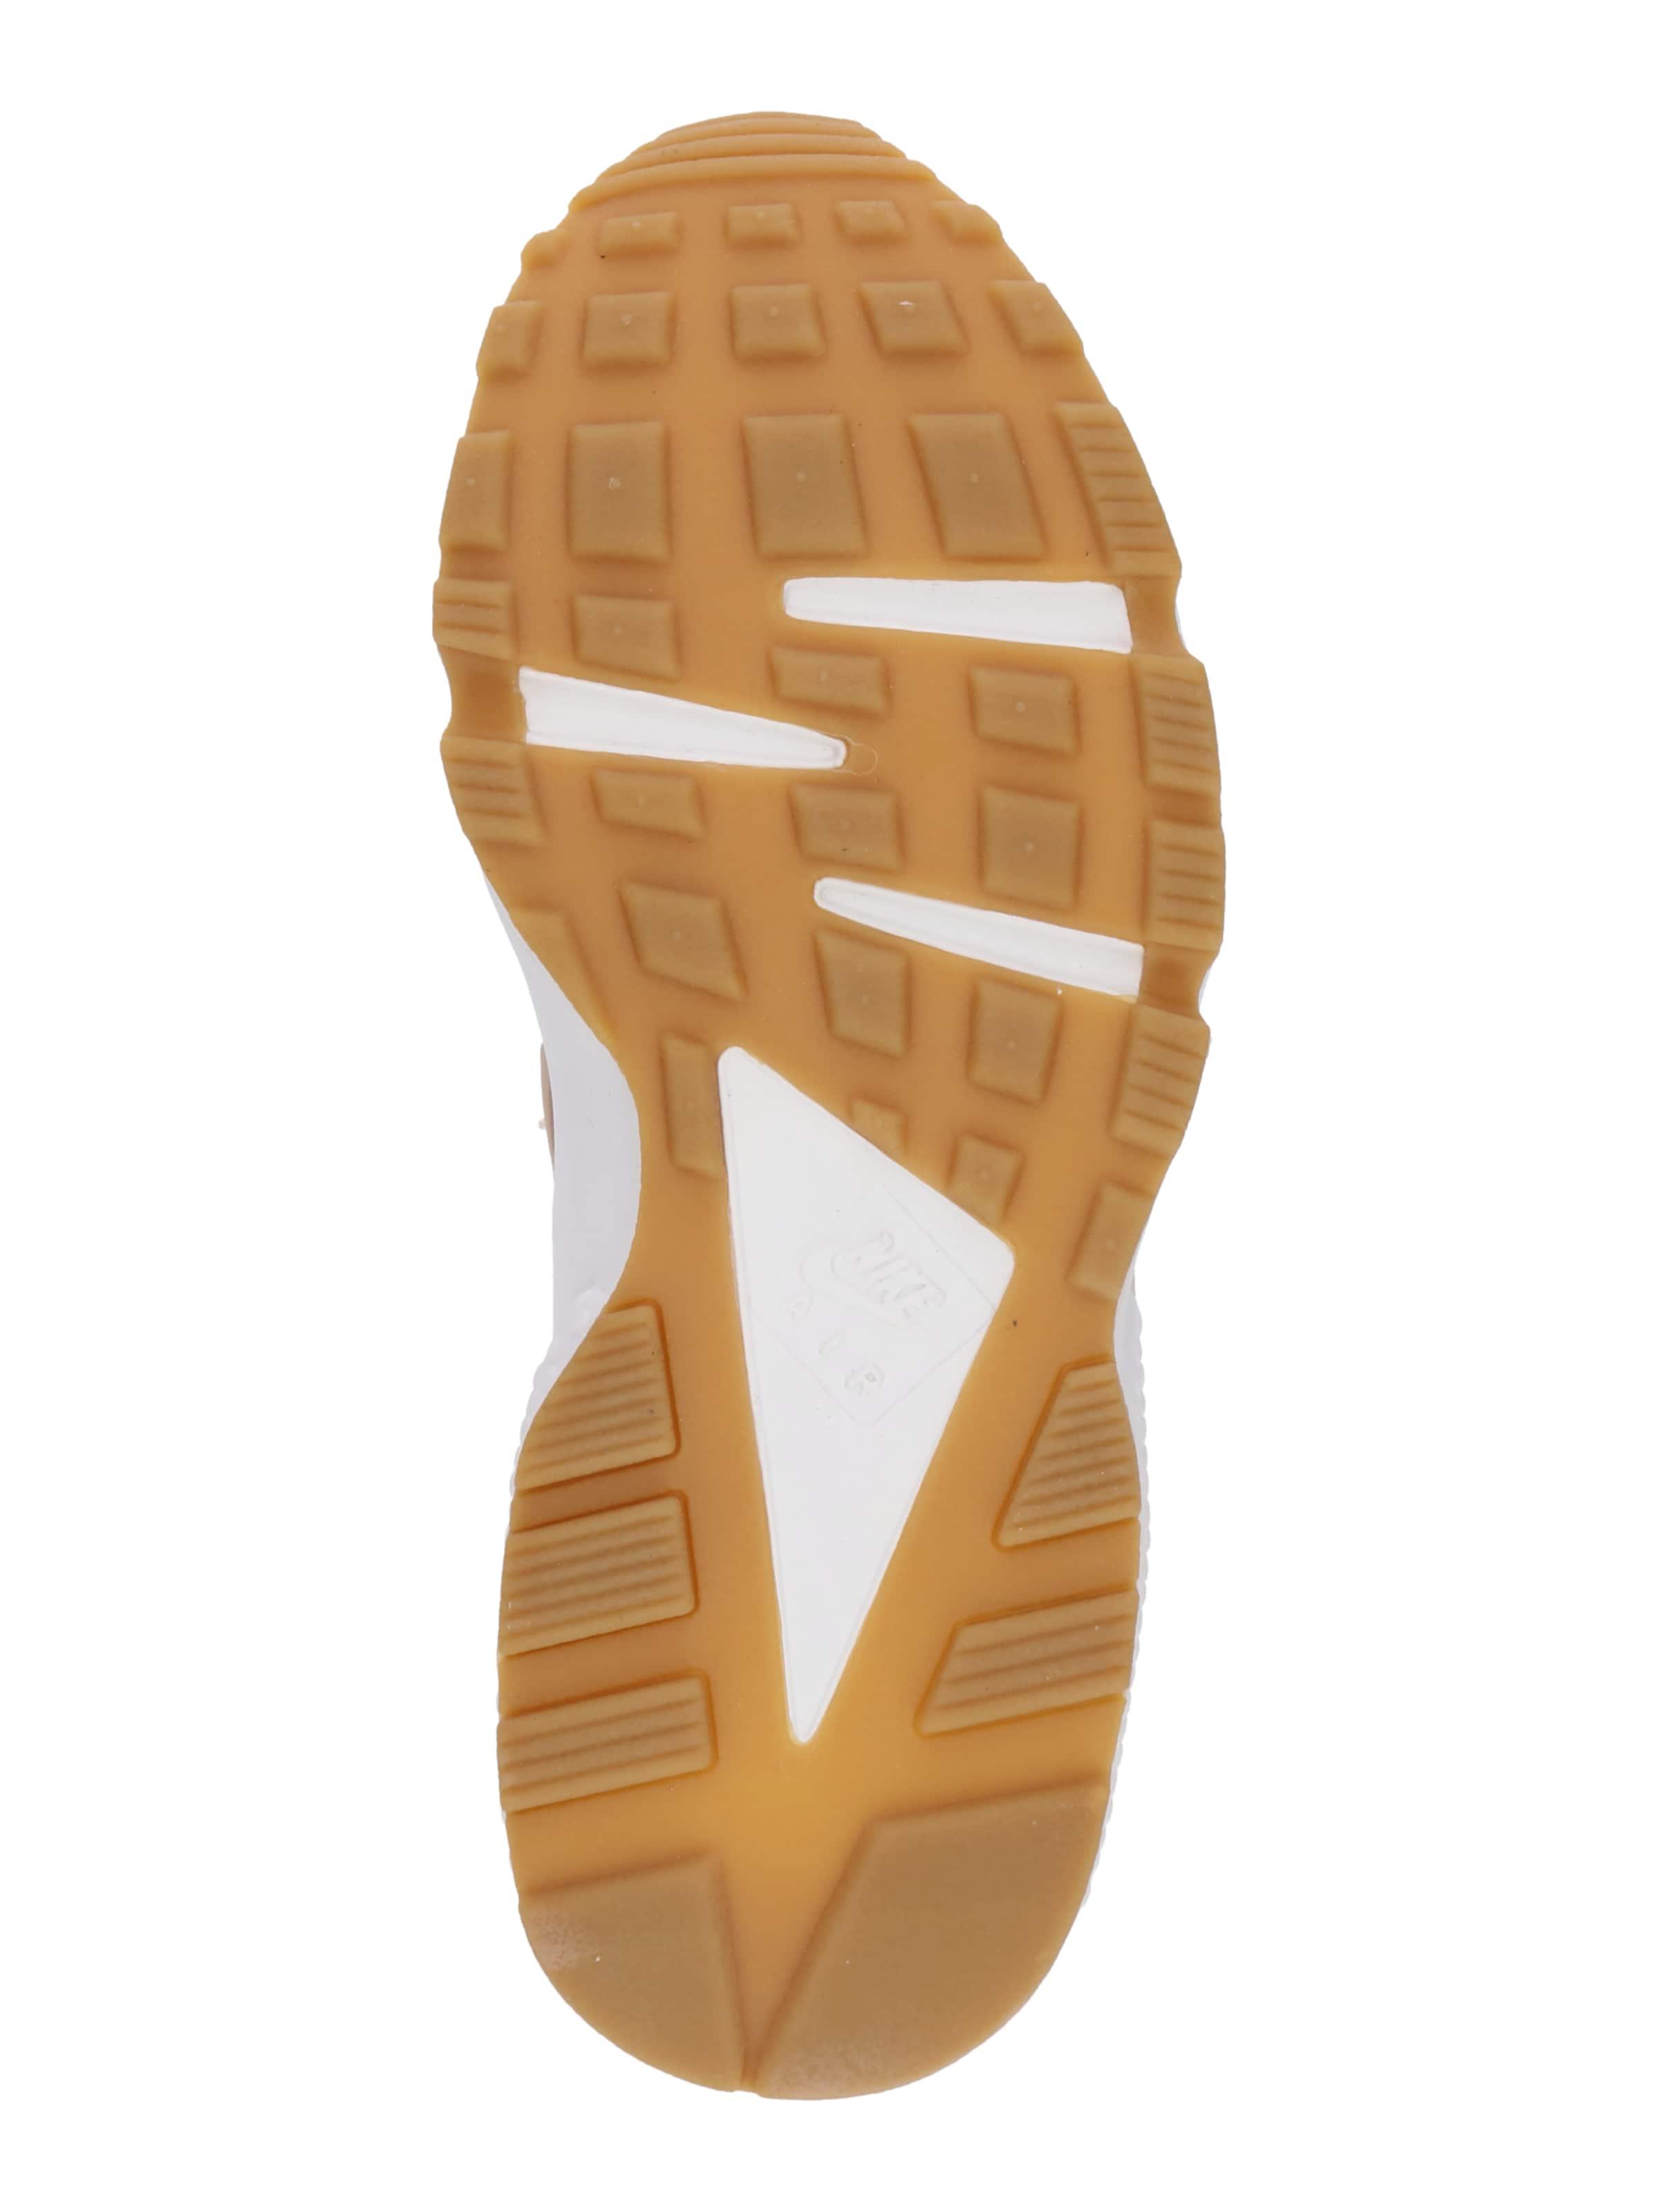 Nike Sportswear Turnschuhe 'Air Huarache Run Synthetik, Textil Textil Textil Markenrabatt 24fc07